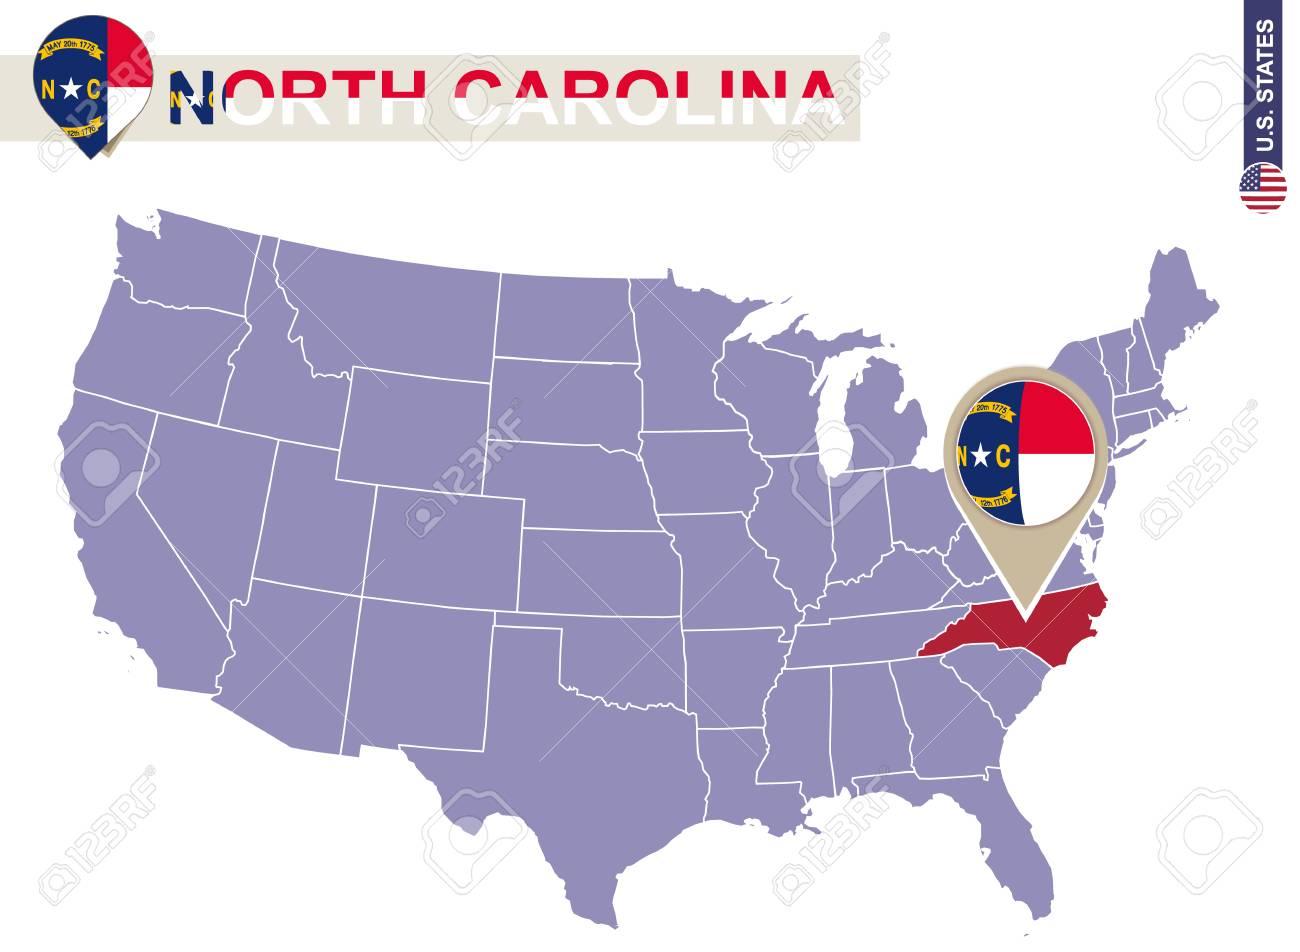 North Carolina State On USA Map. North Carolina Flag And Map ...